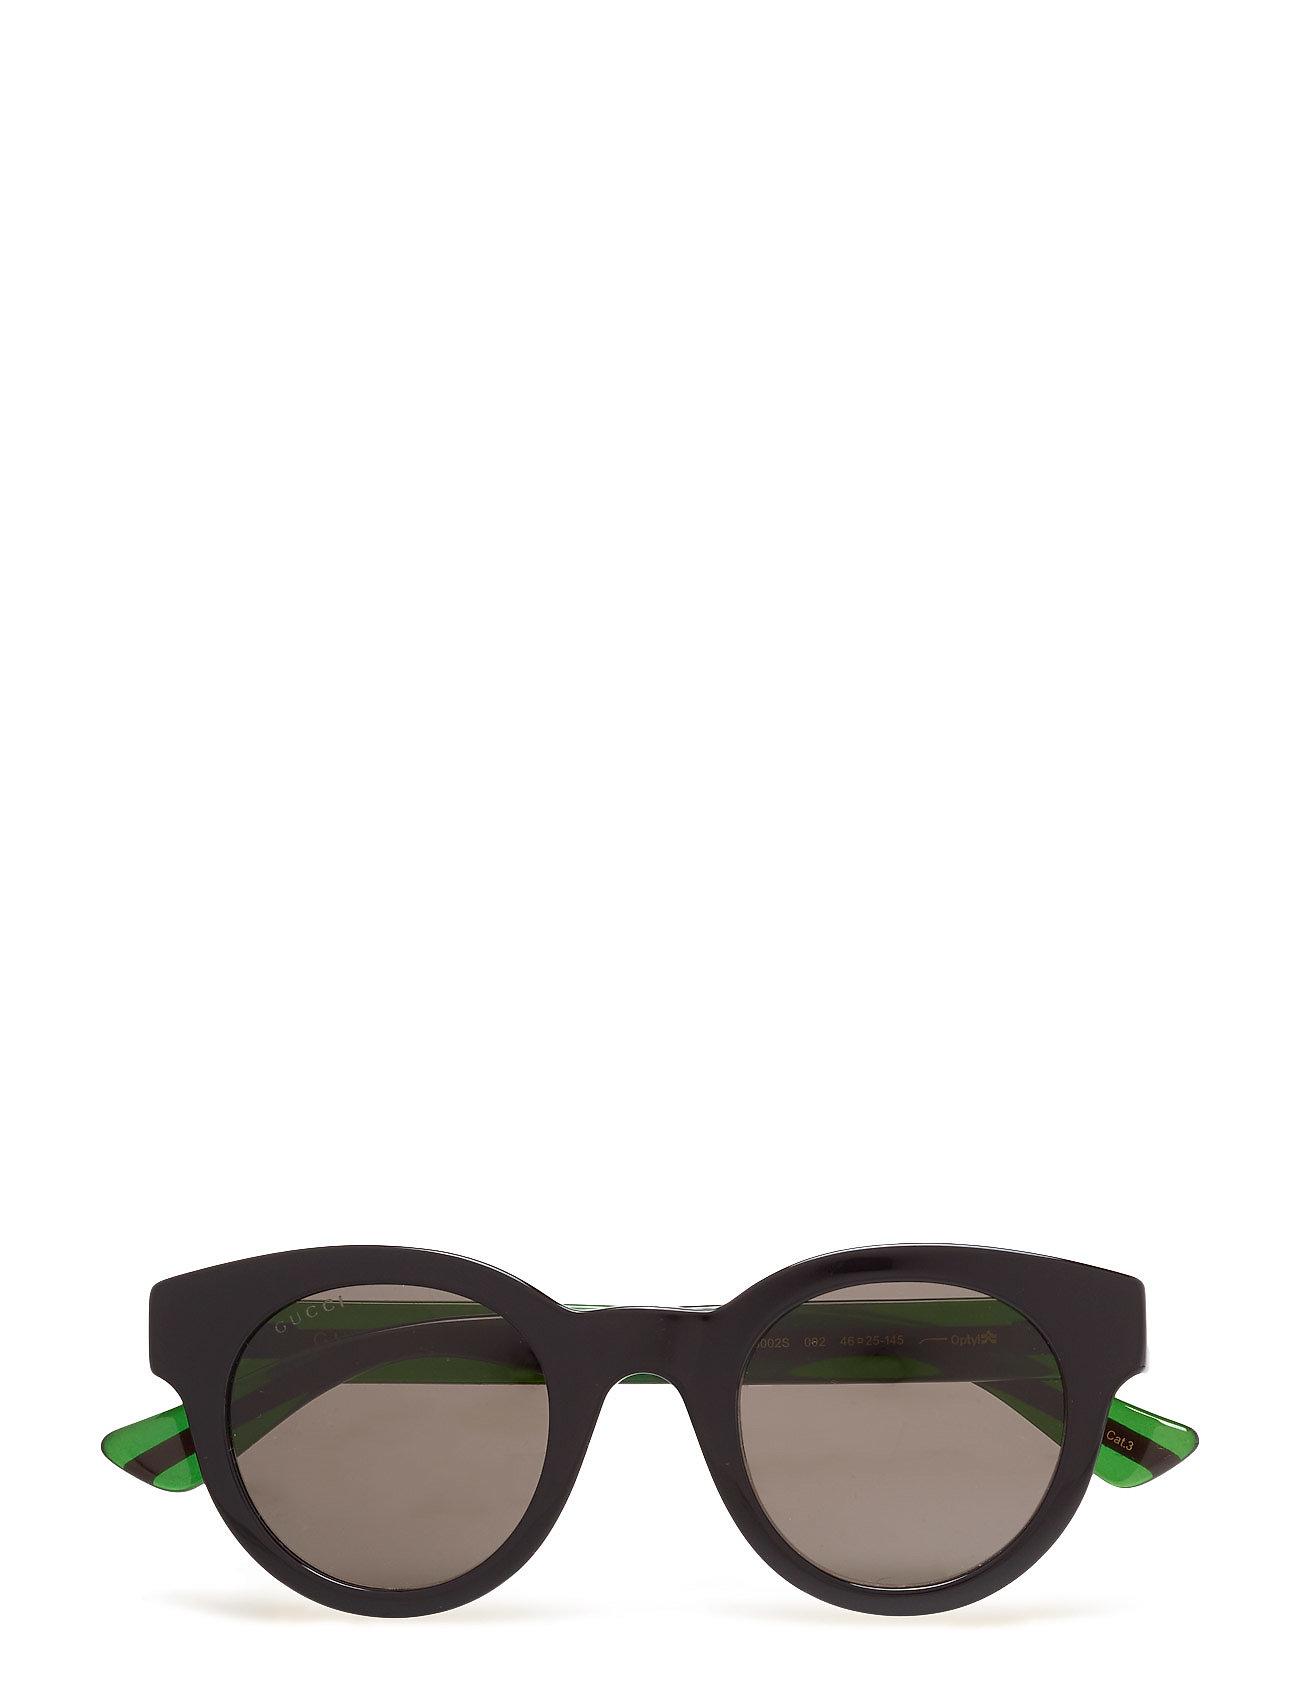 Gg0002s Gucci Sunglasses Solbriller til Damer i